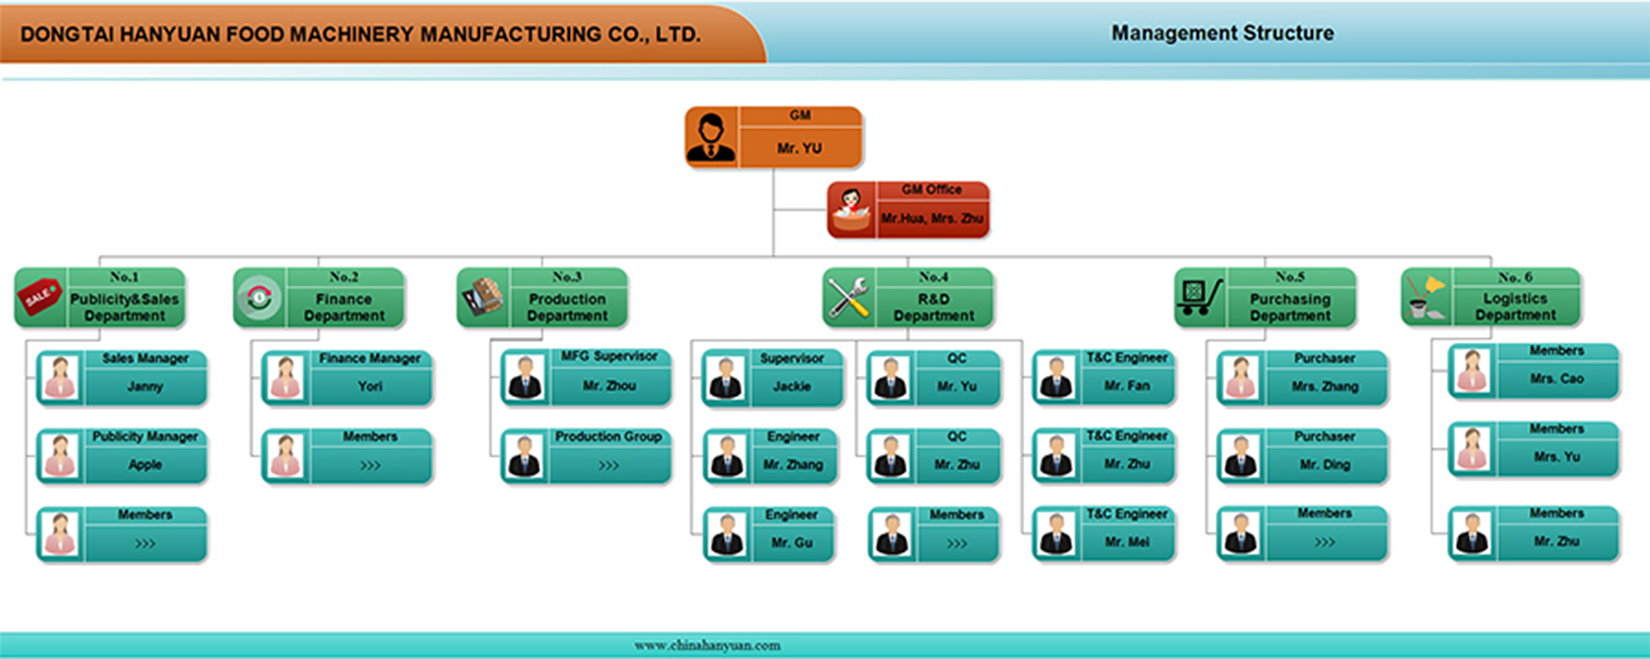 Management Structure-HANYUAN MACHINERY